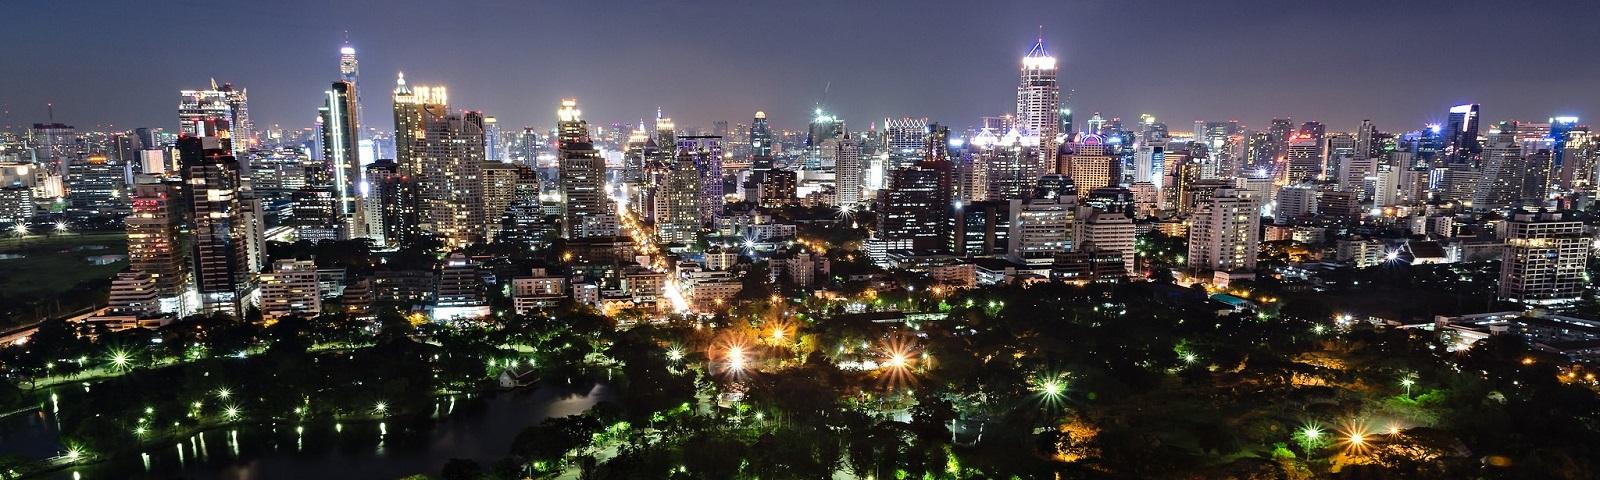 Bangkok skyline (Photo: Flickr/ Hatoriz Kwansiripat)